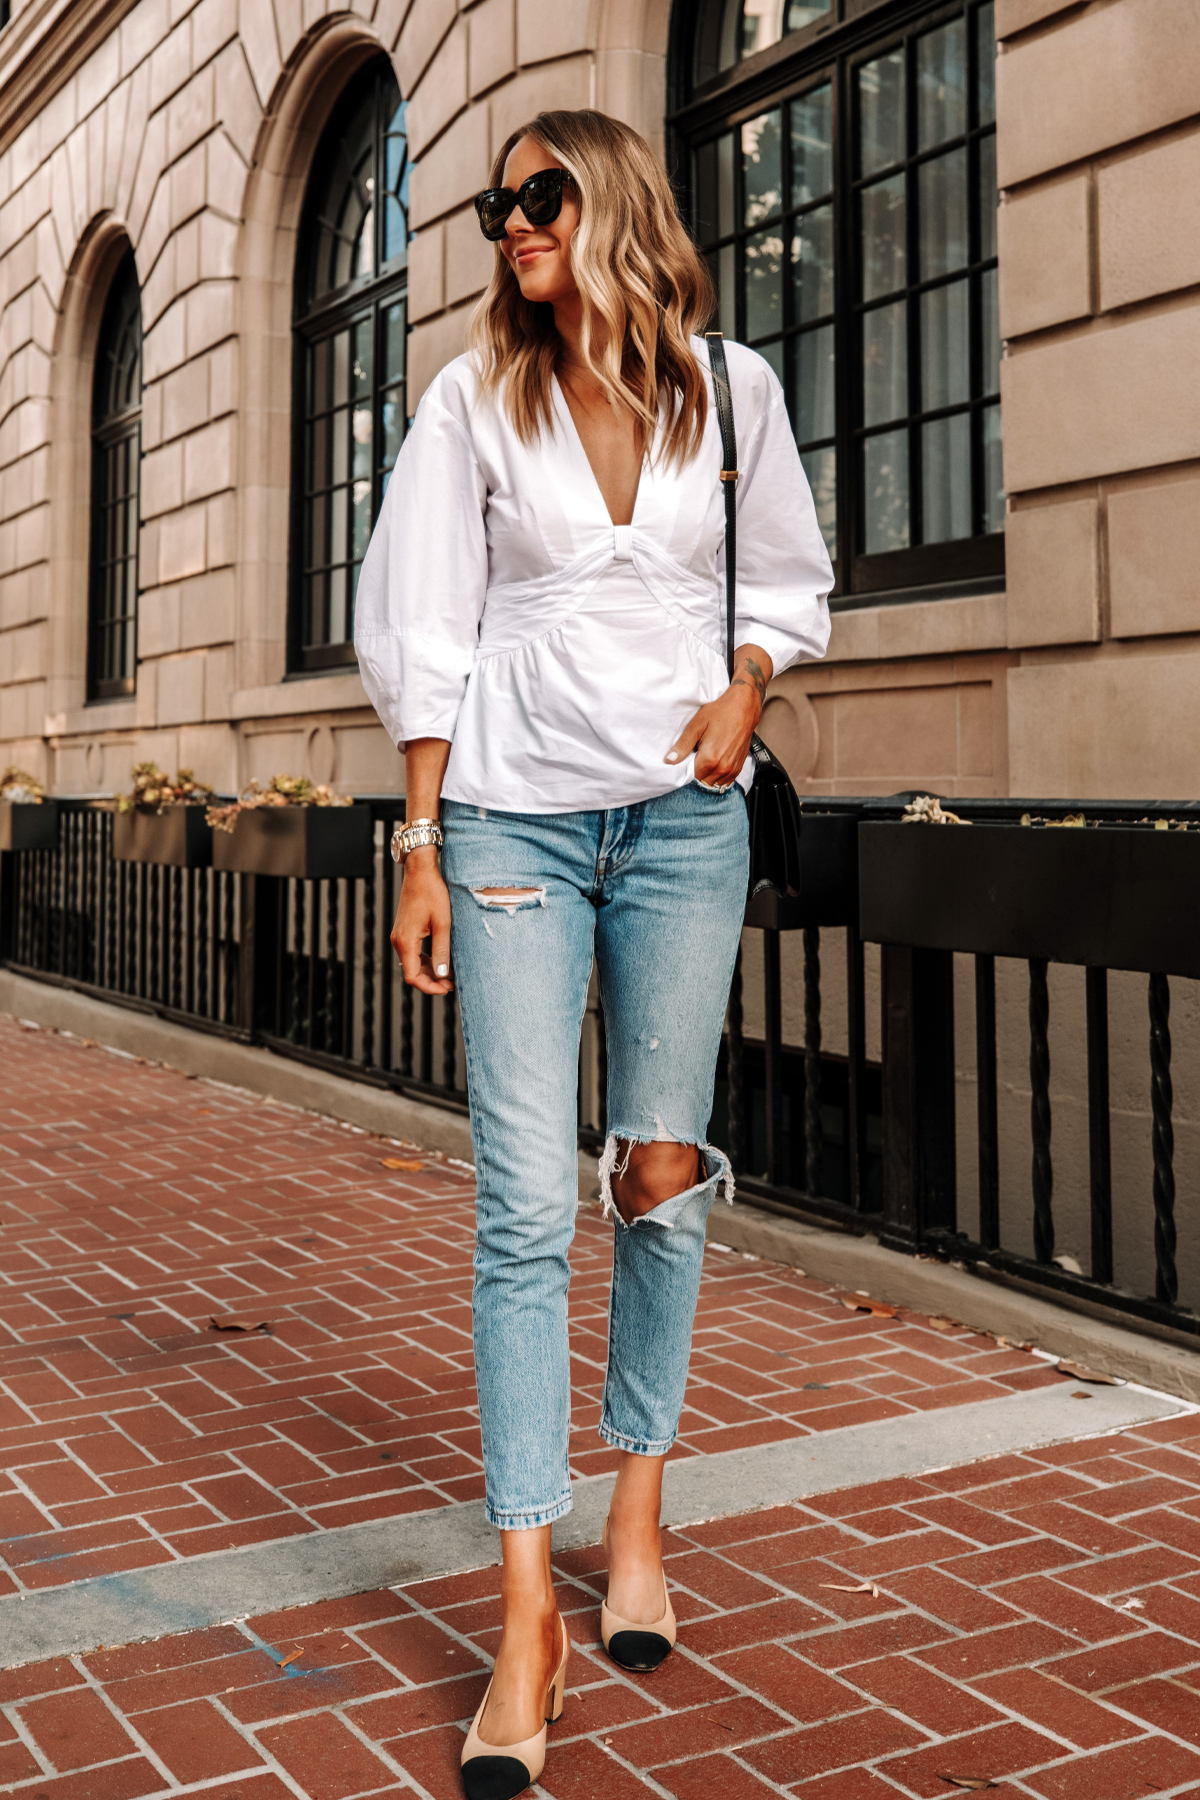 Fashion Jackson Wearing Derek Lam White Blouse Levis 501 Ripped Skinny Jeans Chanel Slingbacks 1